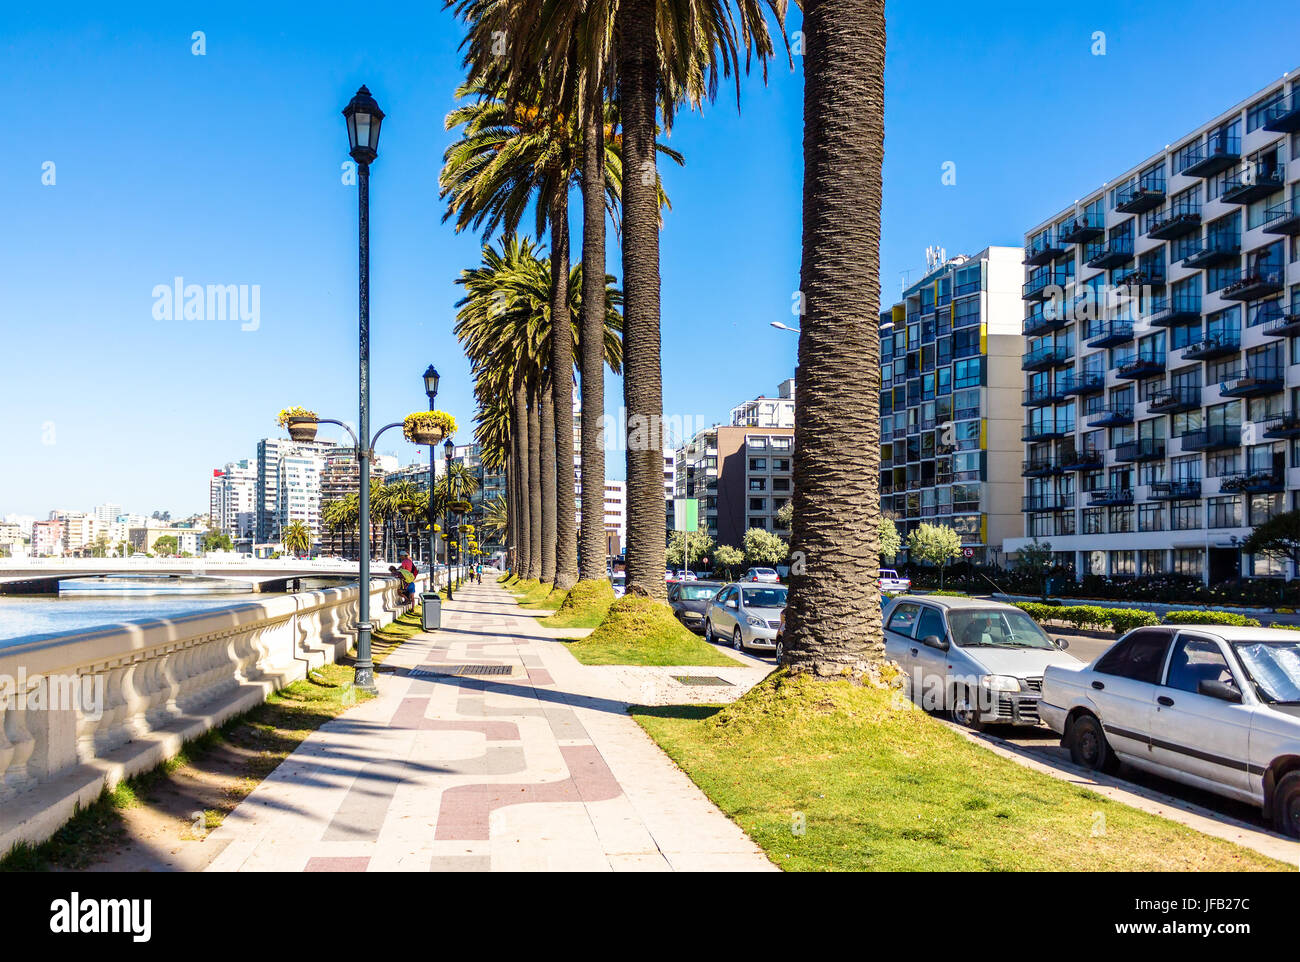 Sidewalk on La Marina embankment in Vina del Mar, Chile - Stock Image